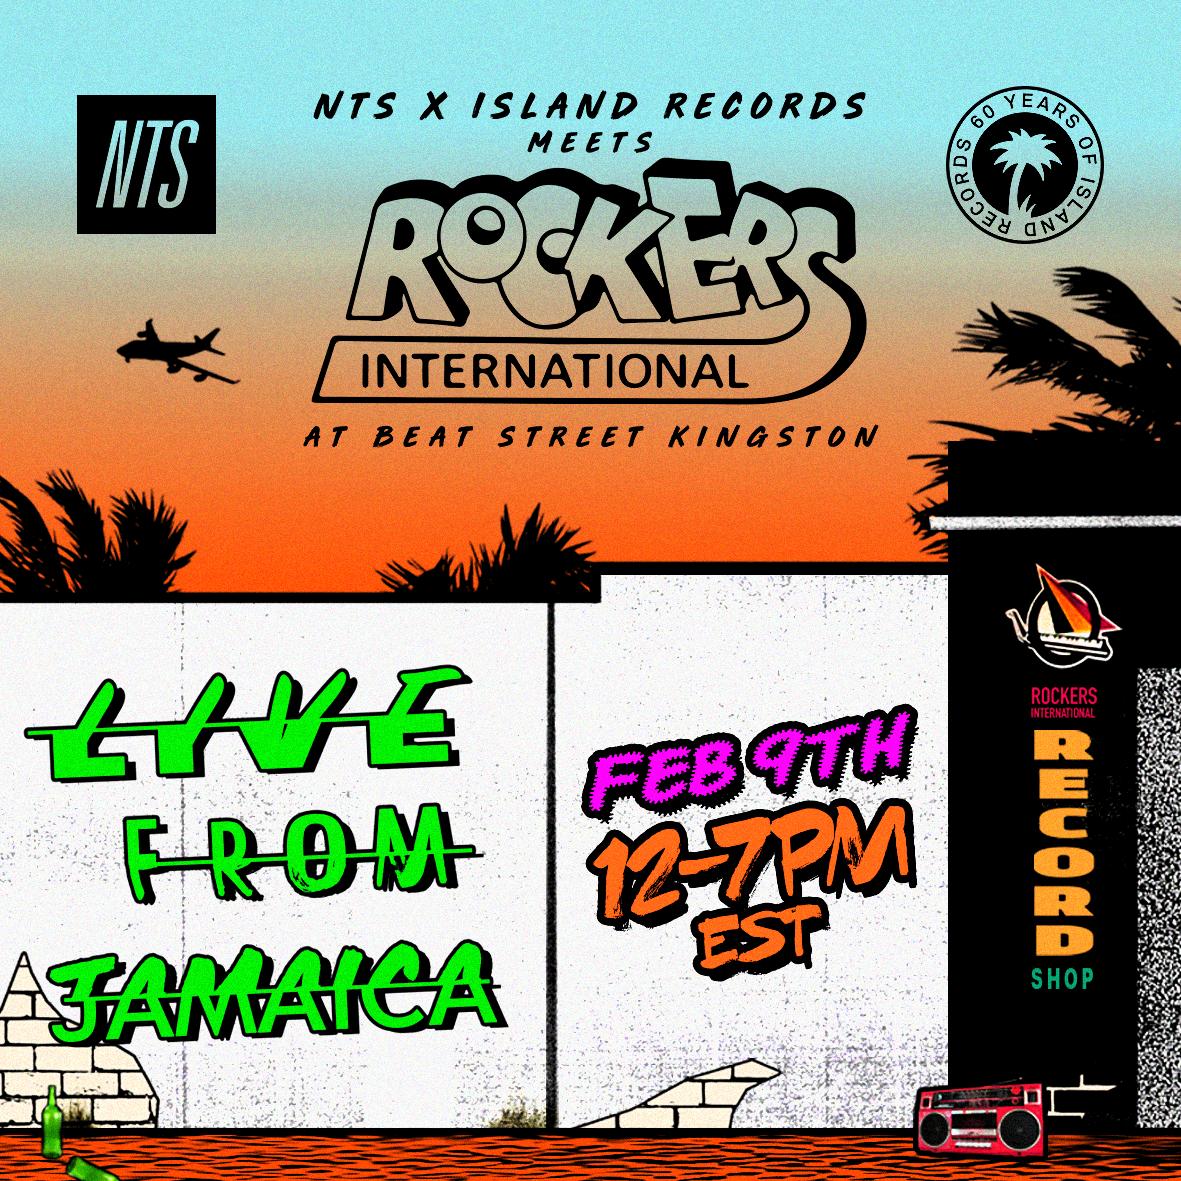 Still - NTS x Island Records meets Rockers @ Beat Street.png